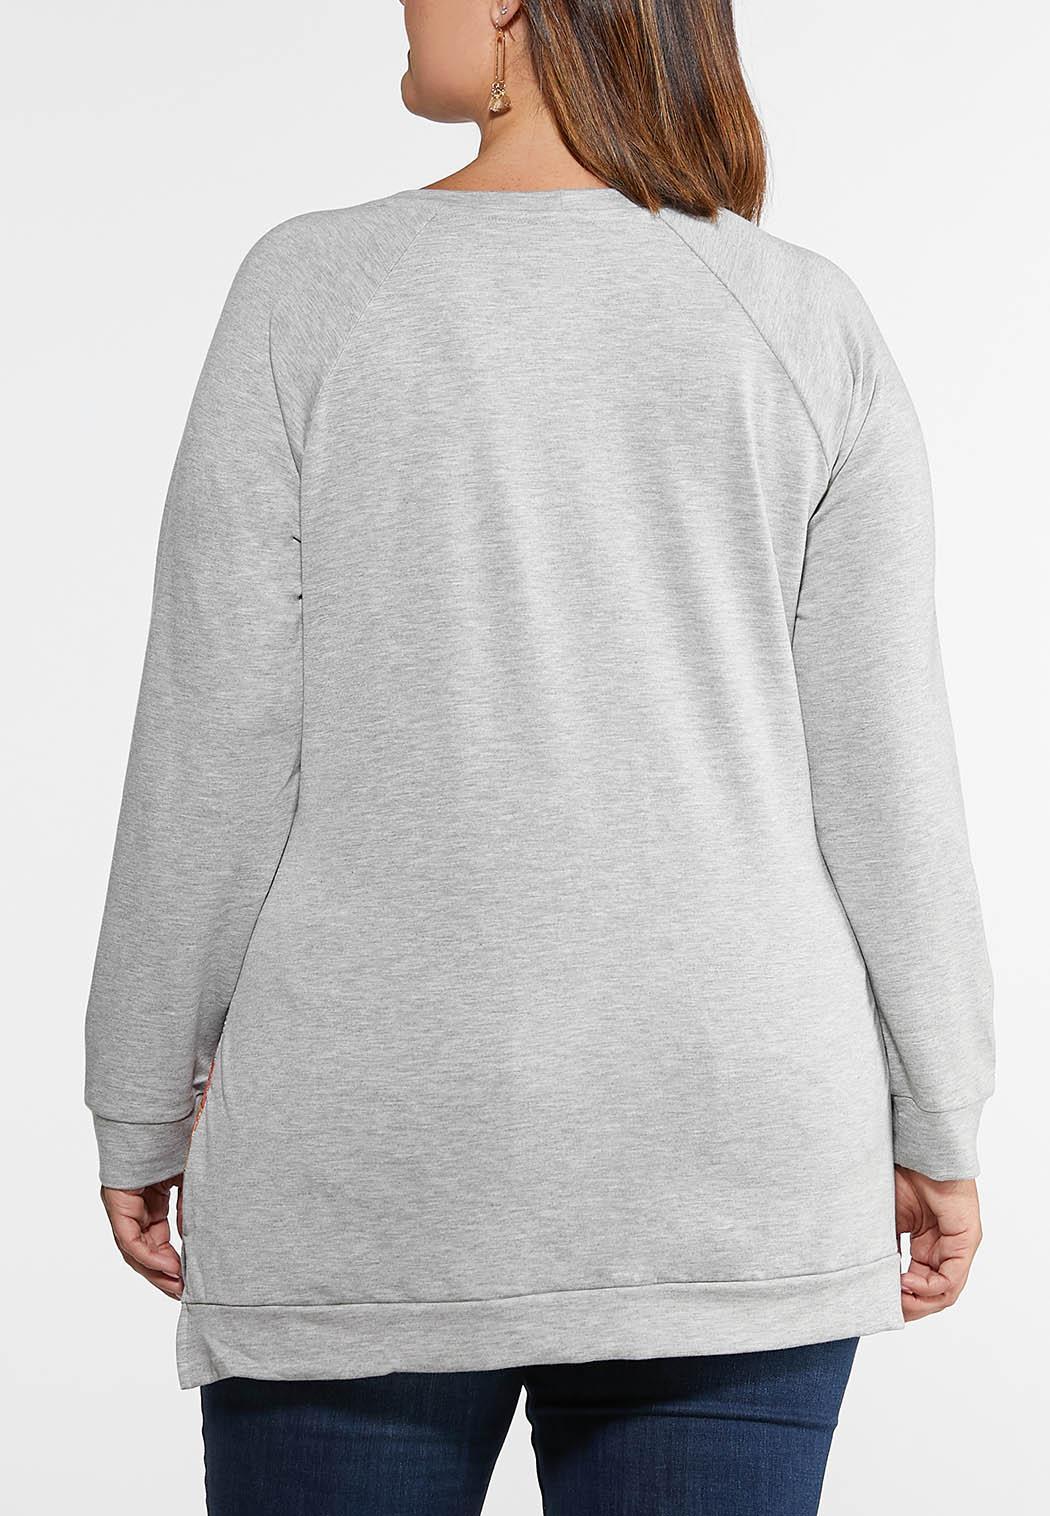 Plus Size Embellished Patchwork Print Top (Item #44108592)